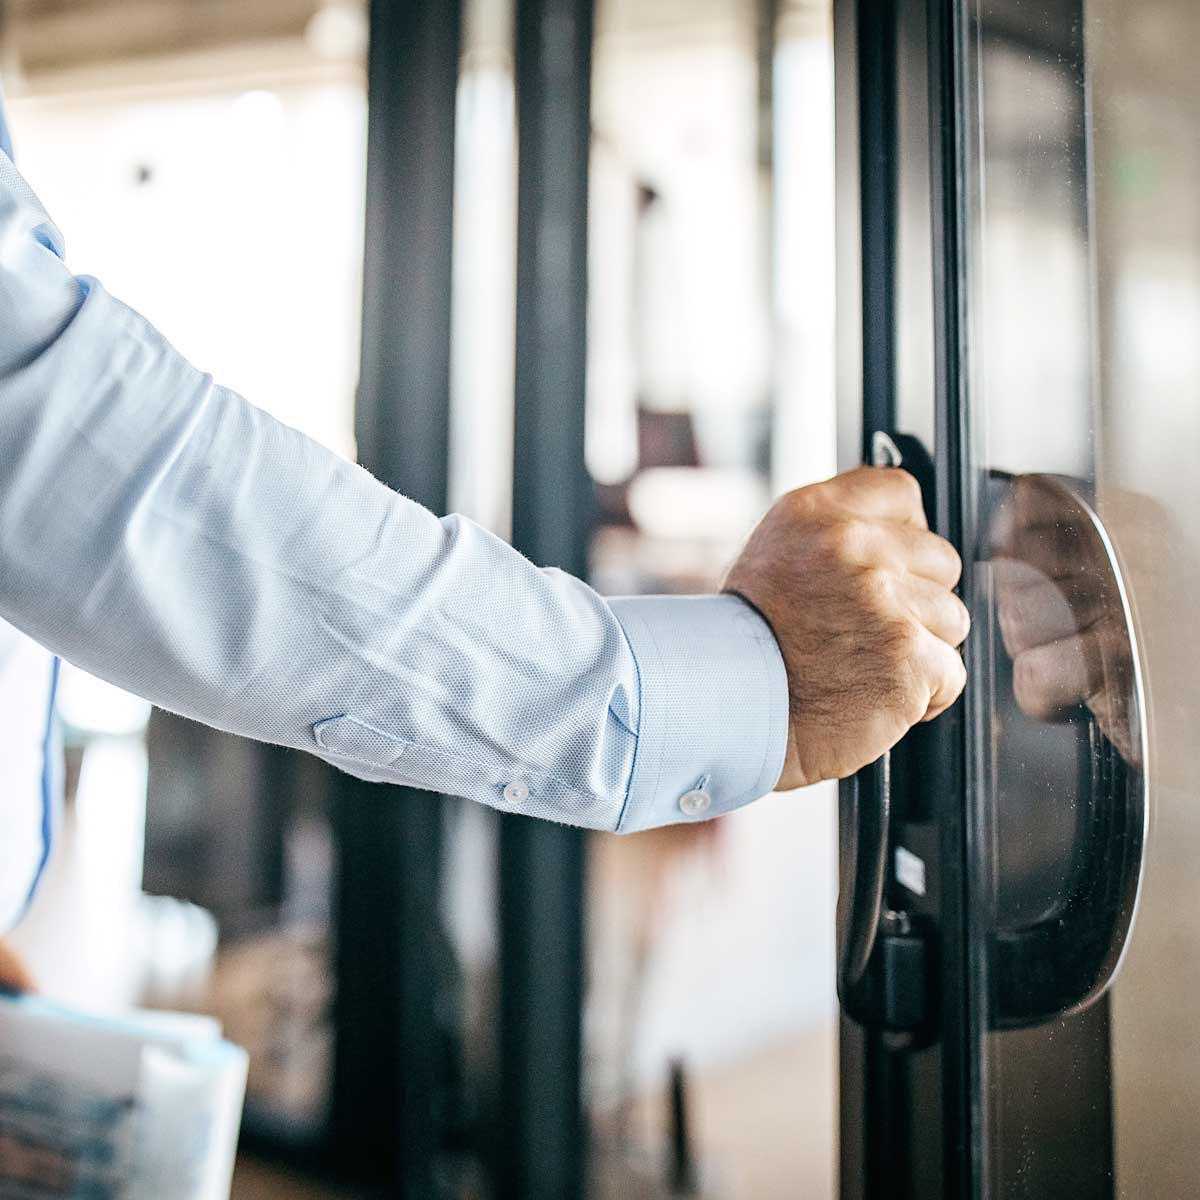 Image of someone closing a door